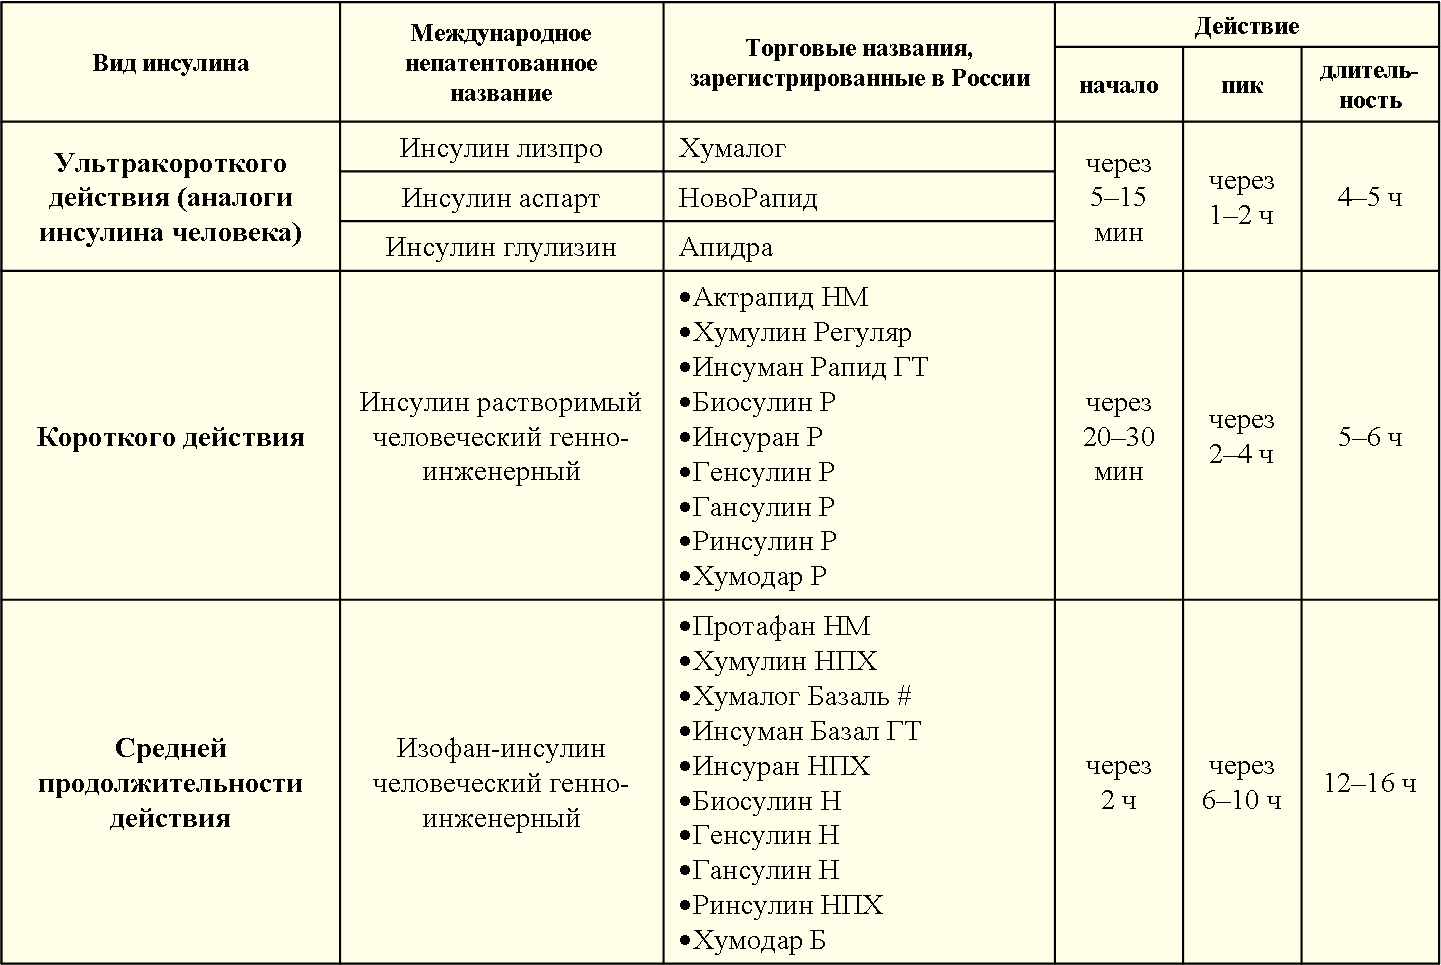 Использование инсулина при болезни 2 типа